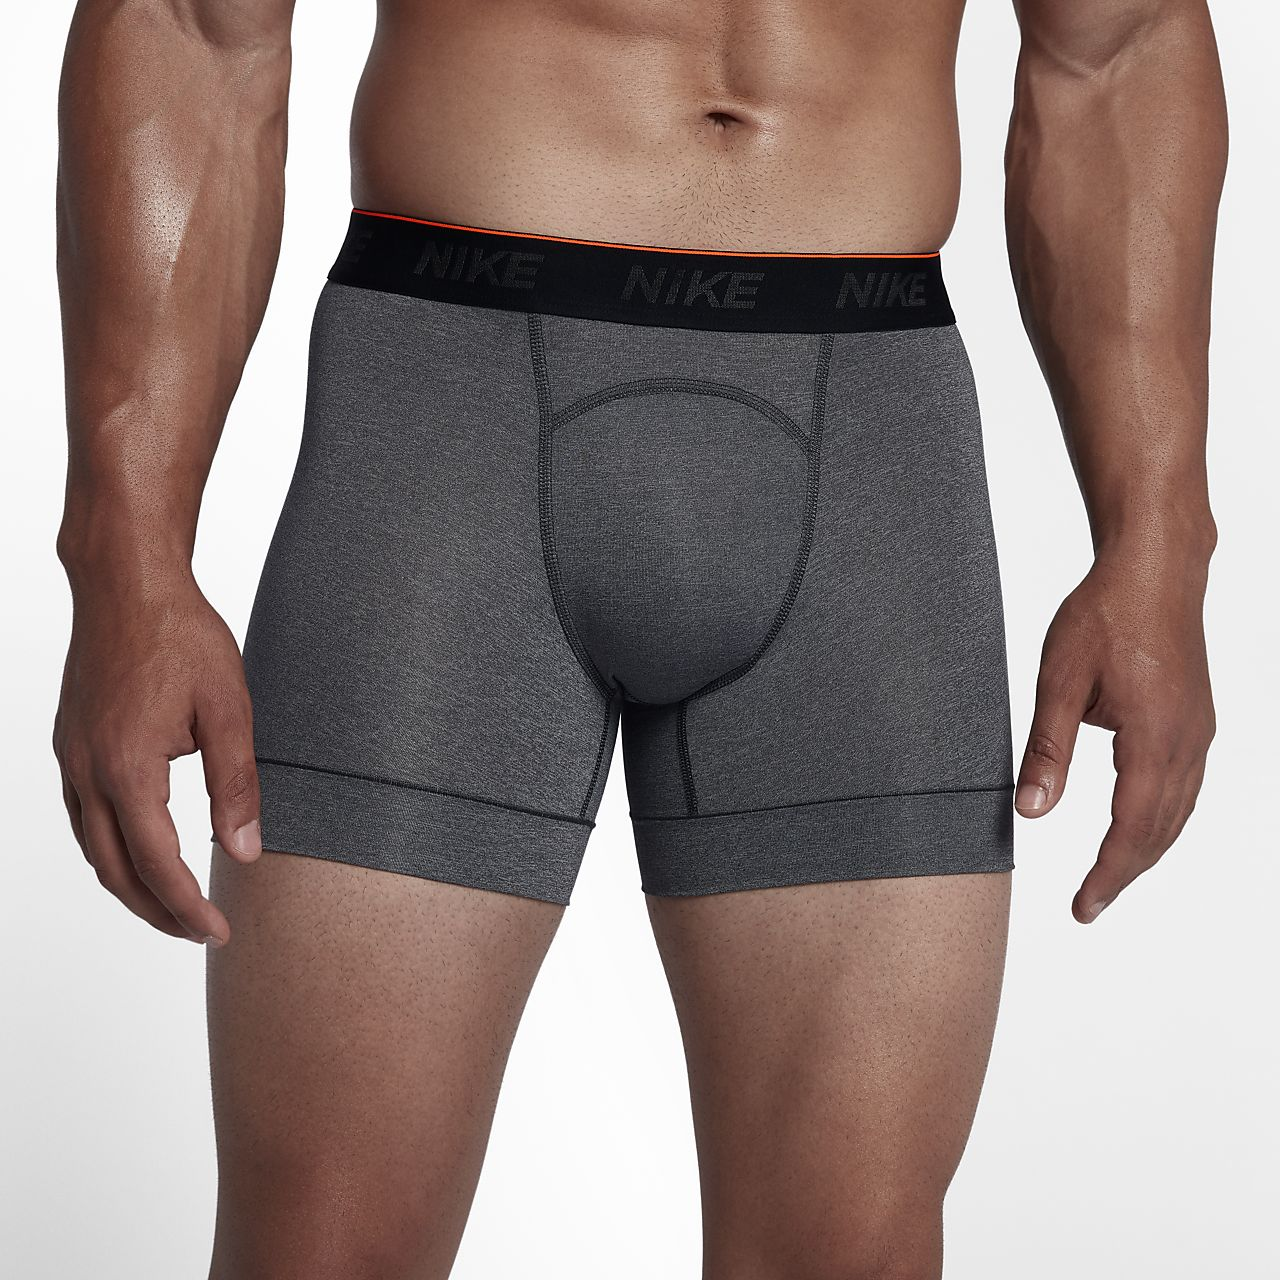 Ropa interior para hombre Nike (2 pares)